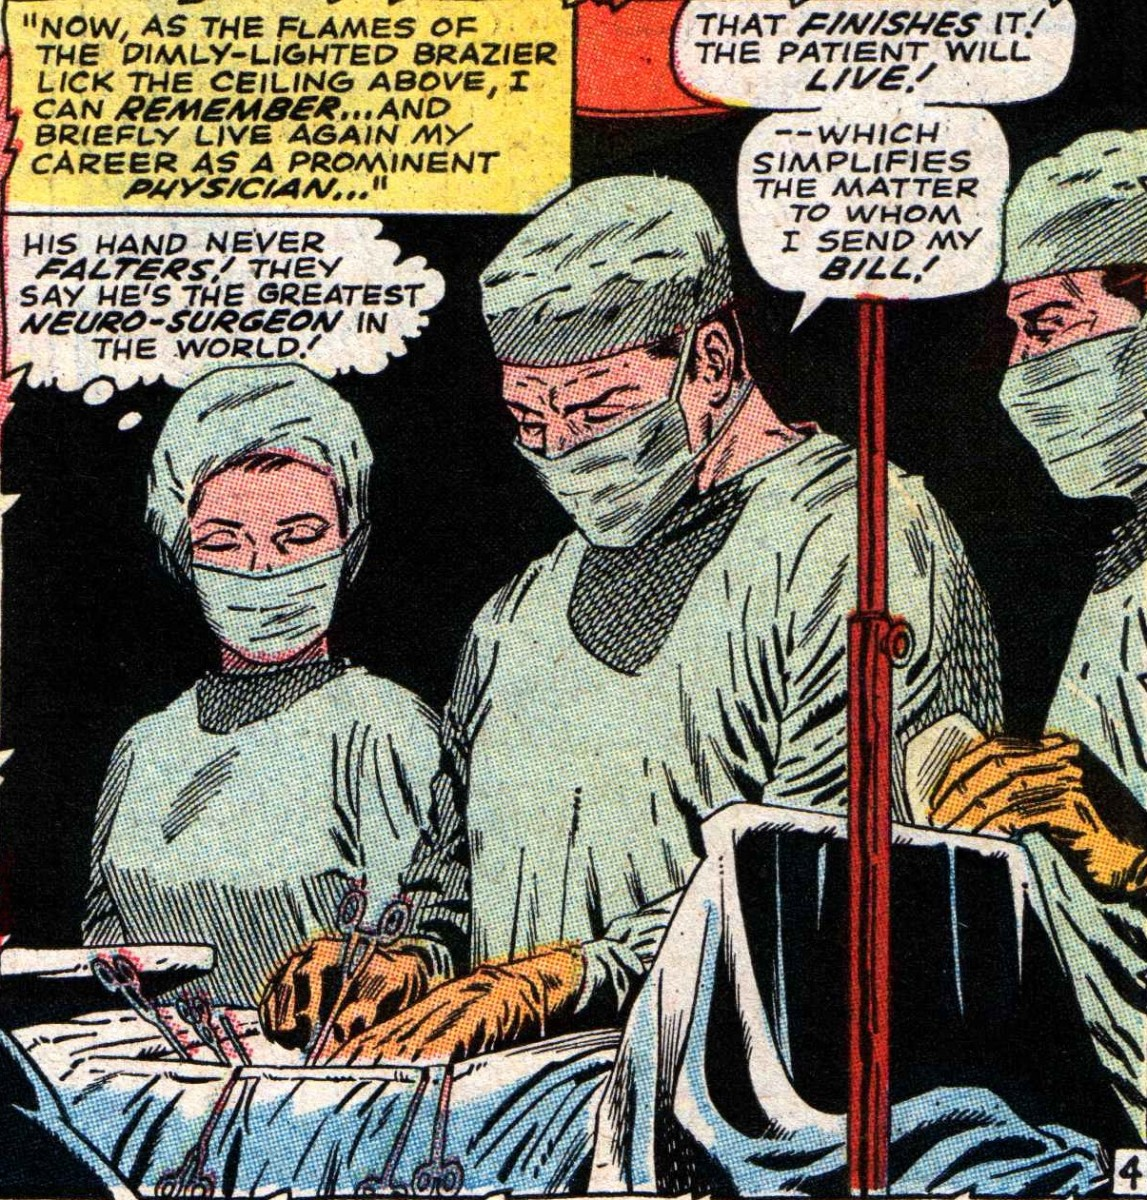 Stephen Strange - The Greatest neurosurgeon in the world.